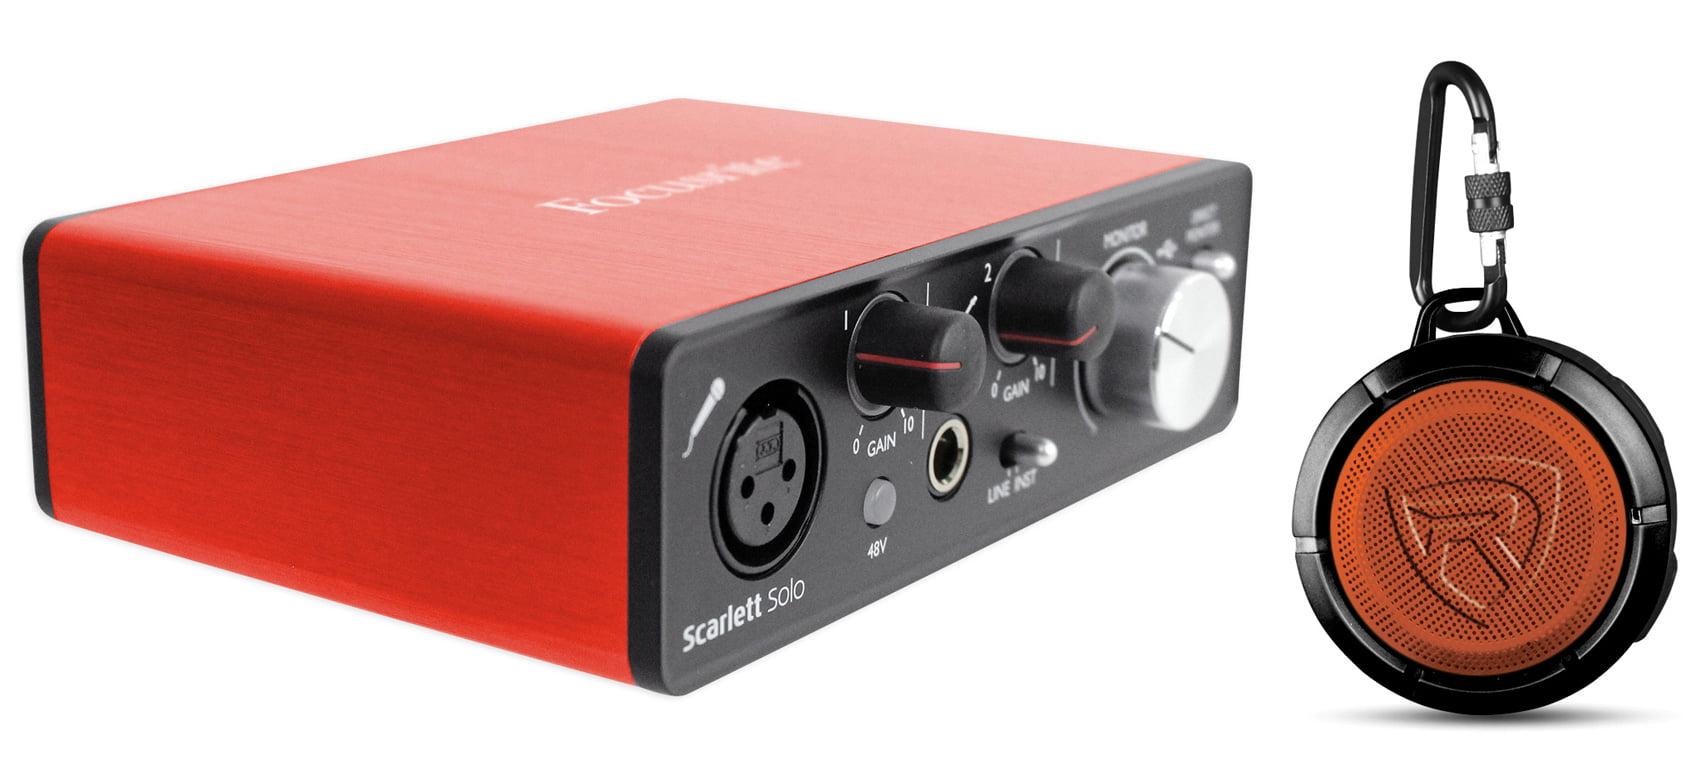 focusrite scarlett solo 2nd gen 192 khz usb 2 0 audio interface speaker. Black Bedroom Furniture Sets. Home Design Ideas